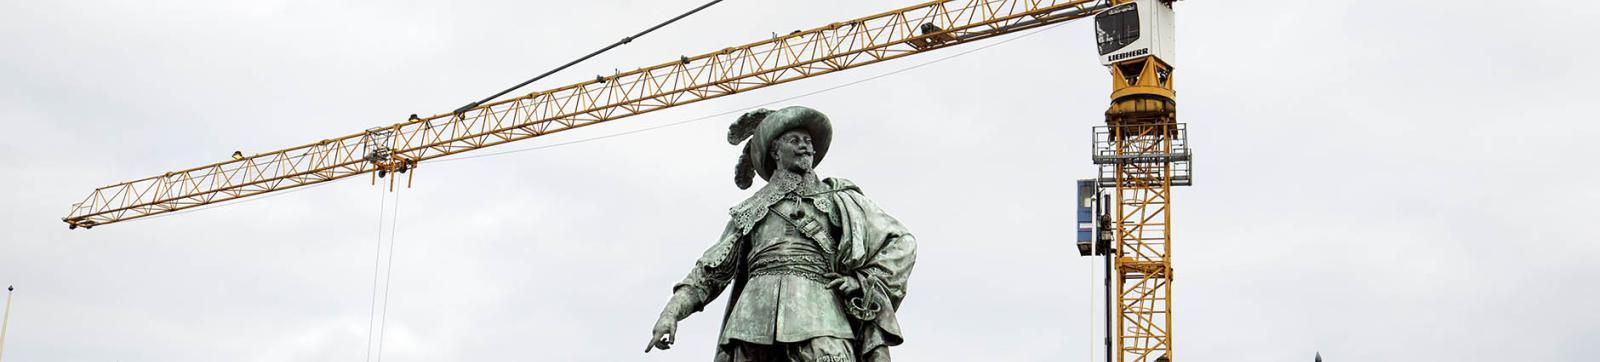 Statyn av Gustav Adolf med byggkran i bakgrunden